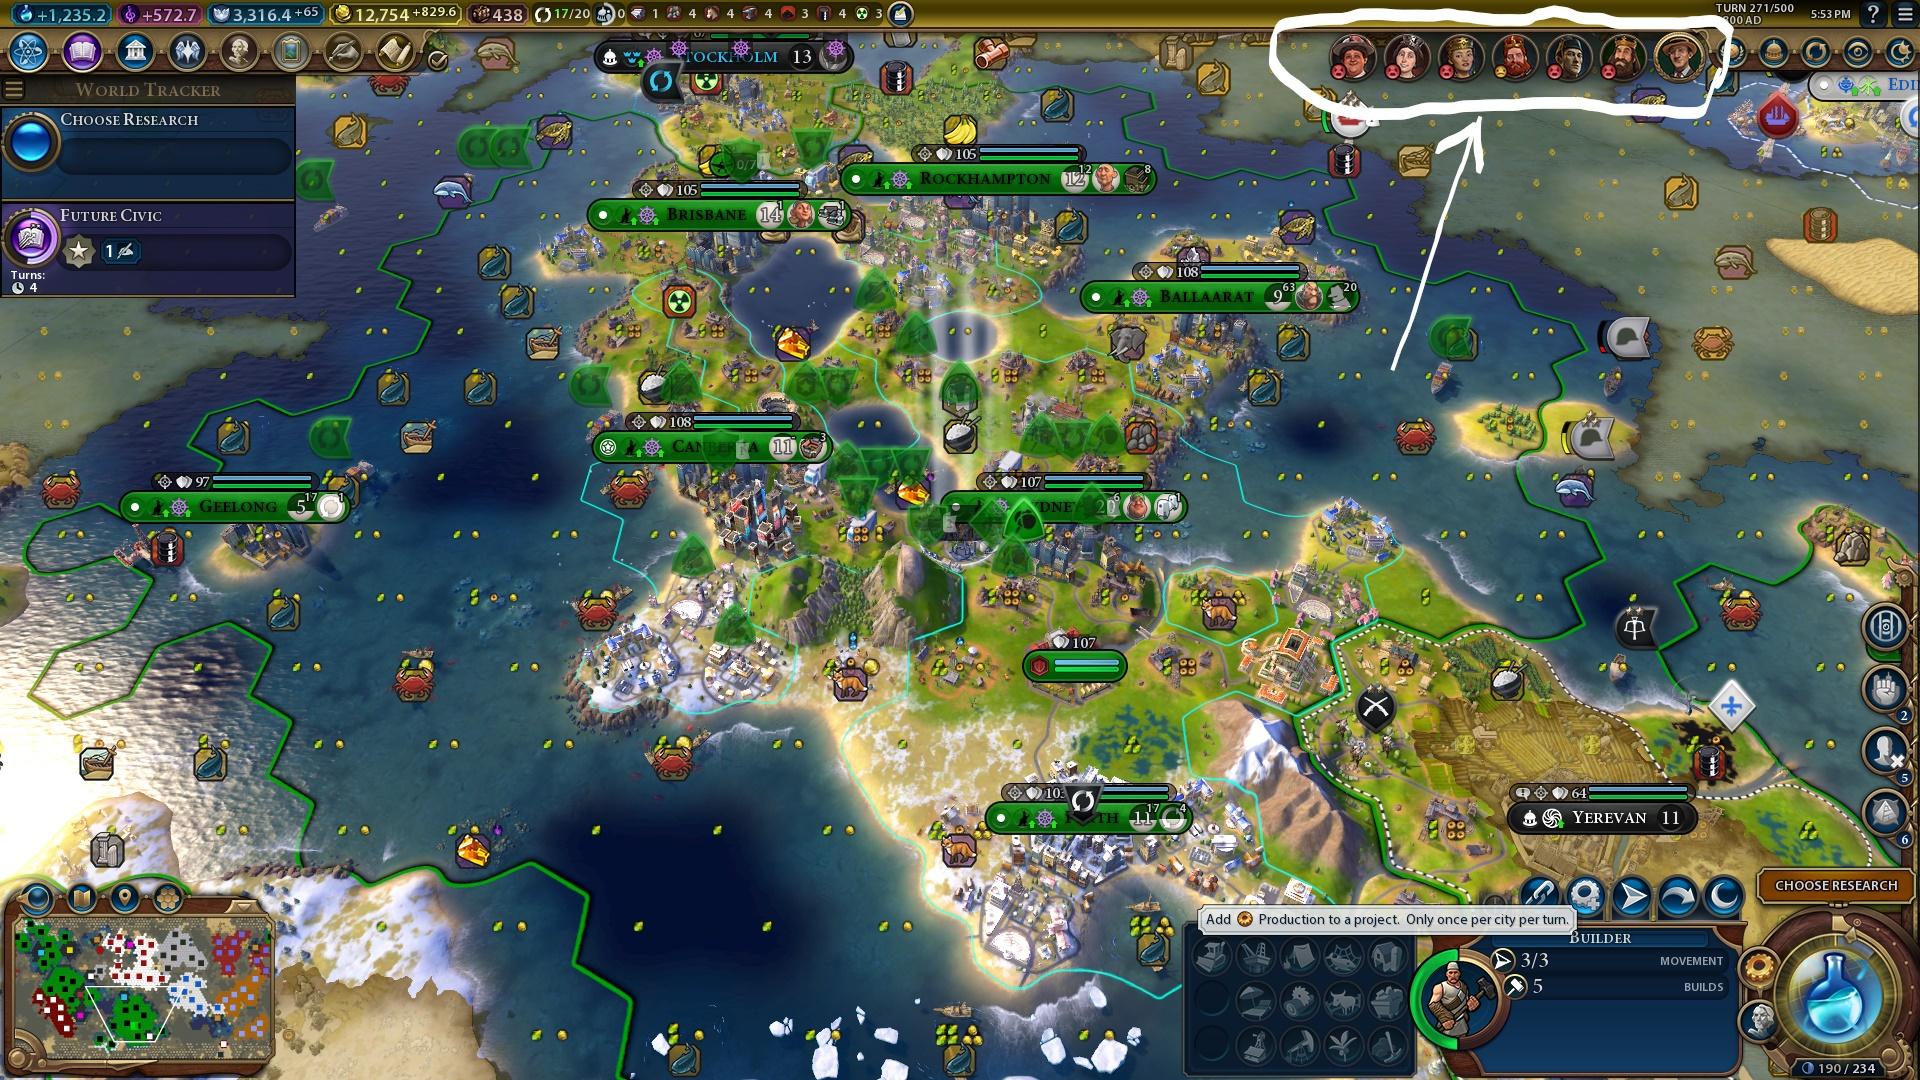 Sid Meier's Civilization VI (DX11) 7_15_2018 5_53_54 PM_LI.jpg